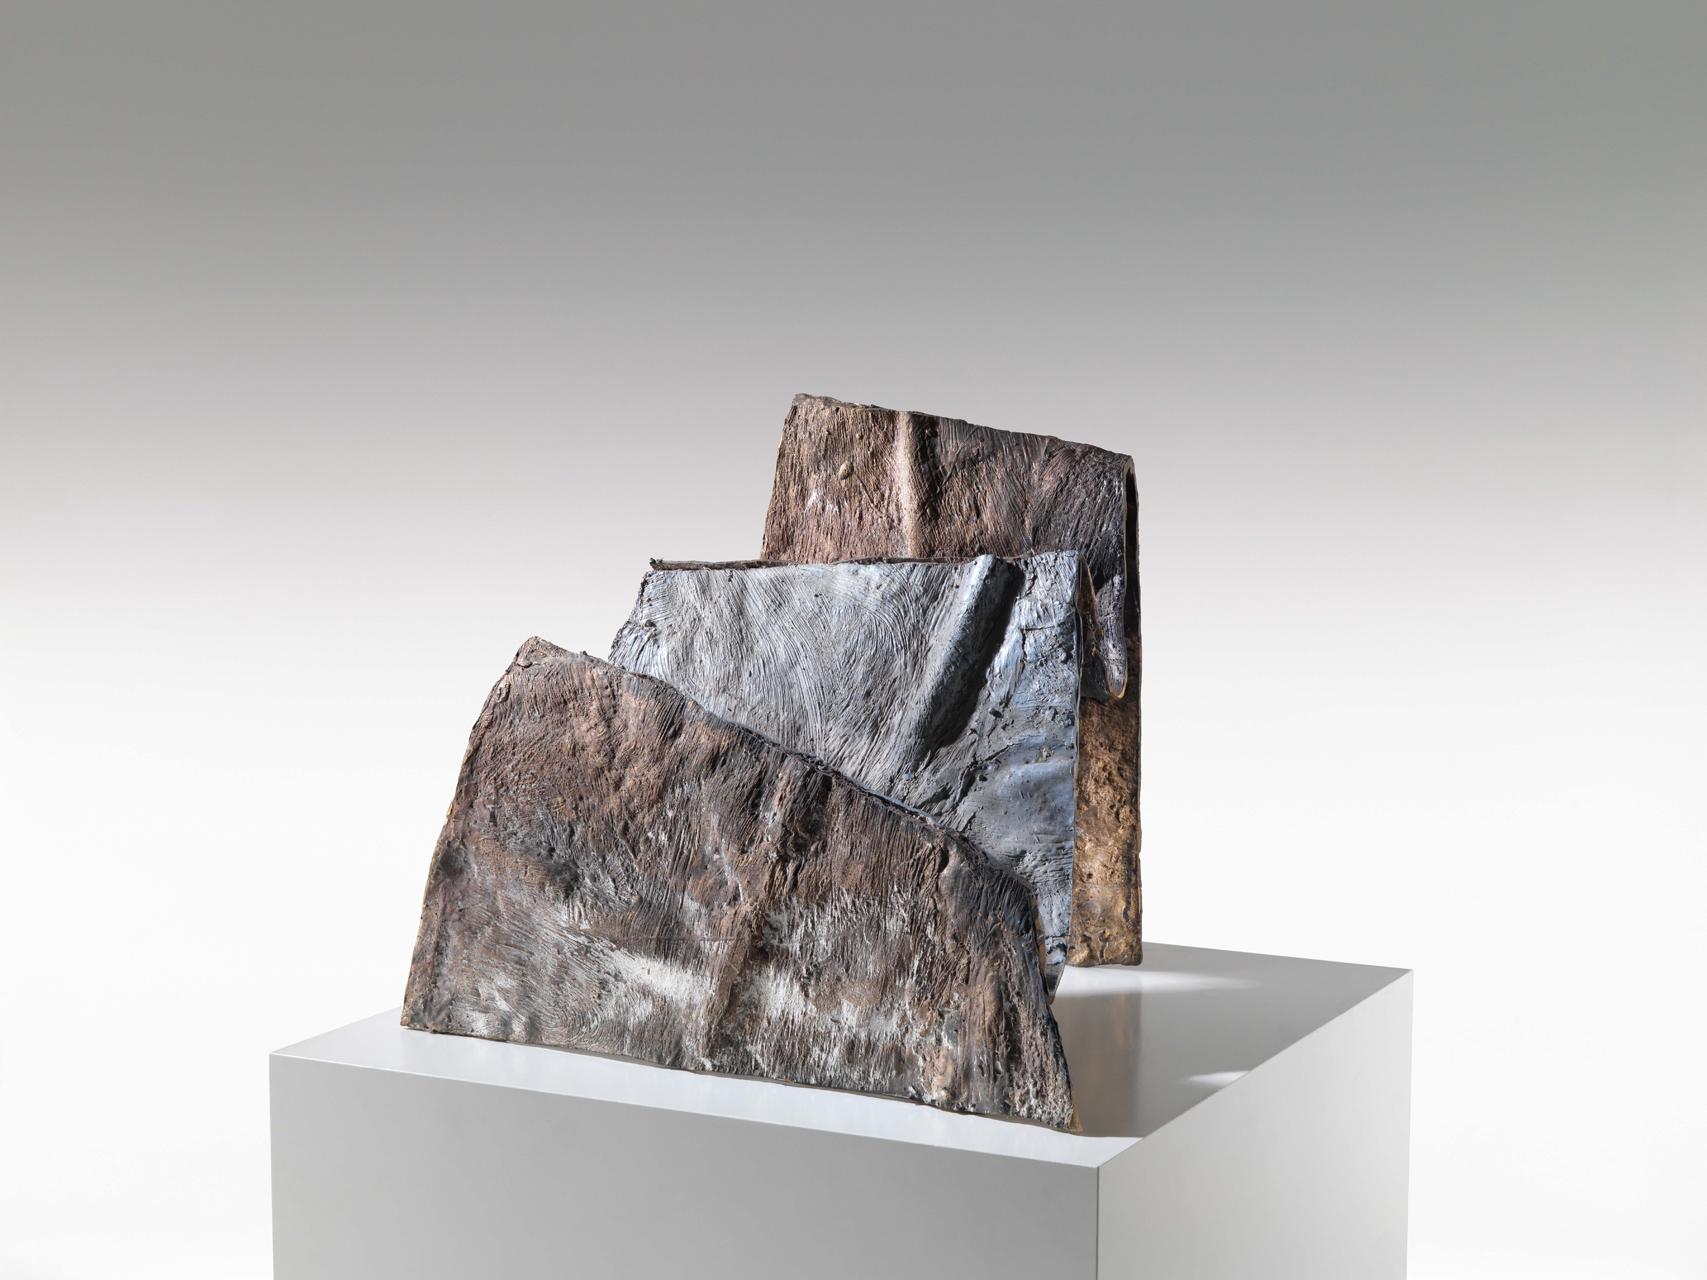 Emil Cimiotti, Stufen, 1998, Bronze, gussrauh, bemalt, 44 x 50 x 42 cm